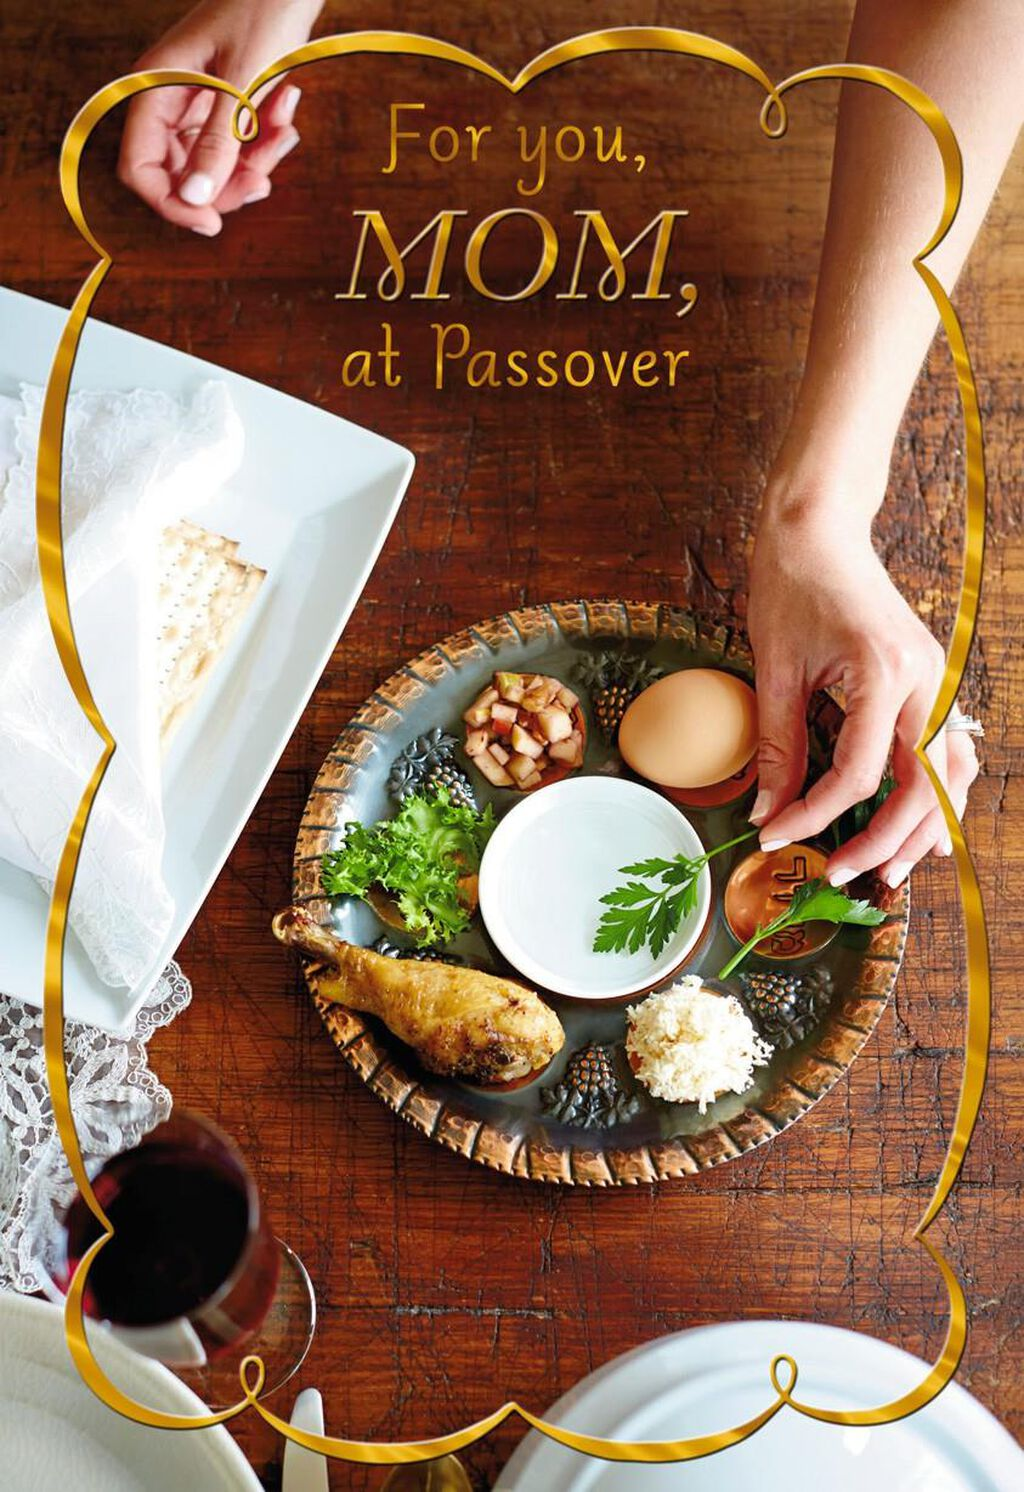 Seder Memories Passover Card For Mom Greeting Cards Hallmark